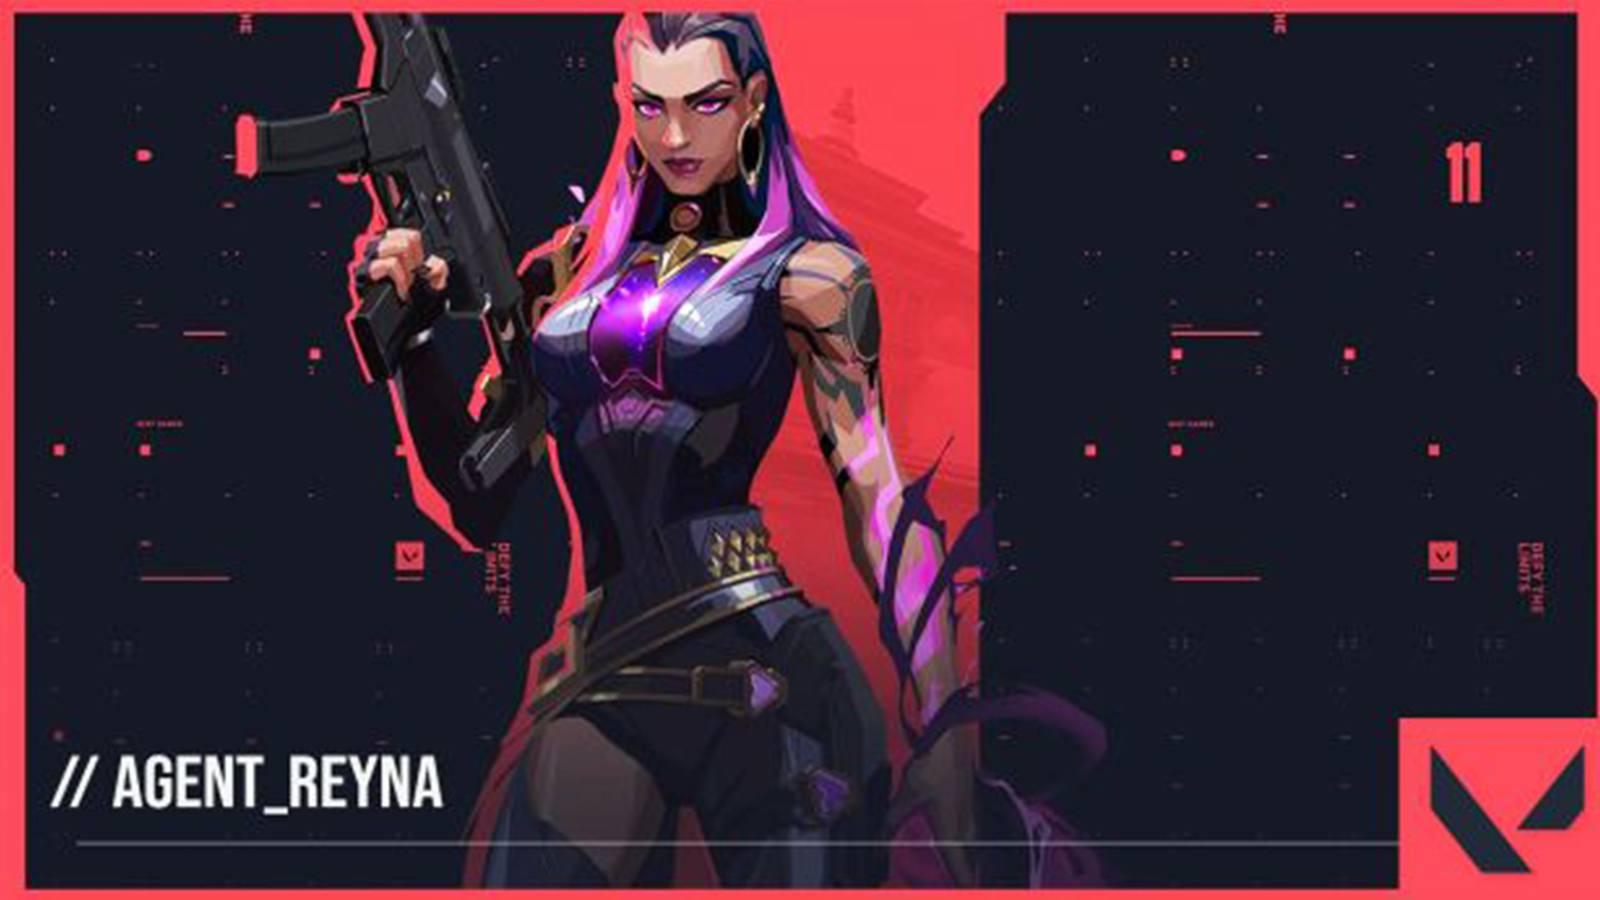 Capacités nouvel agent de Valorant, Reyna